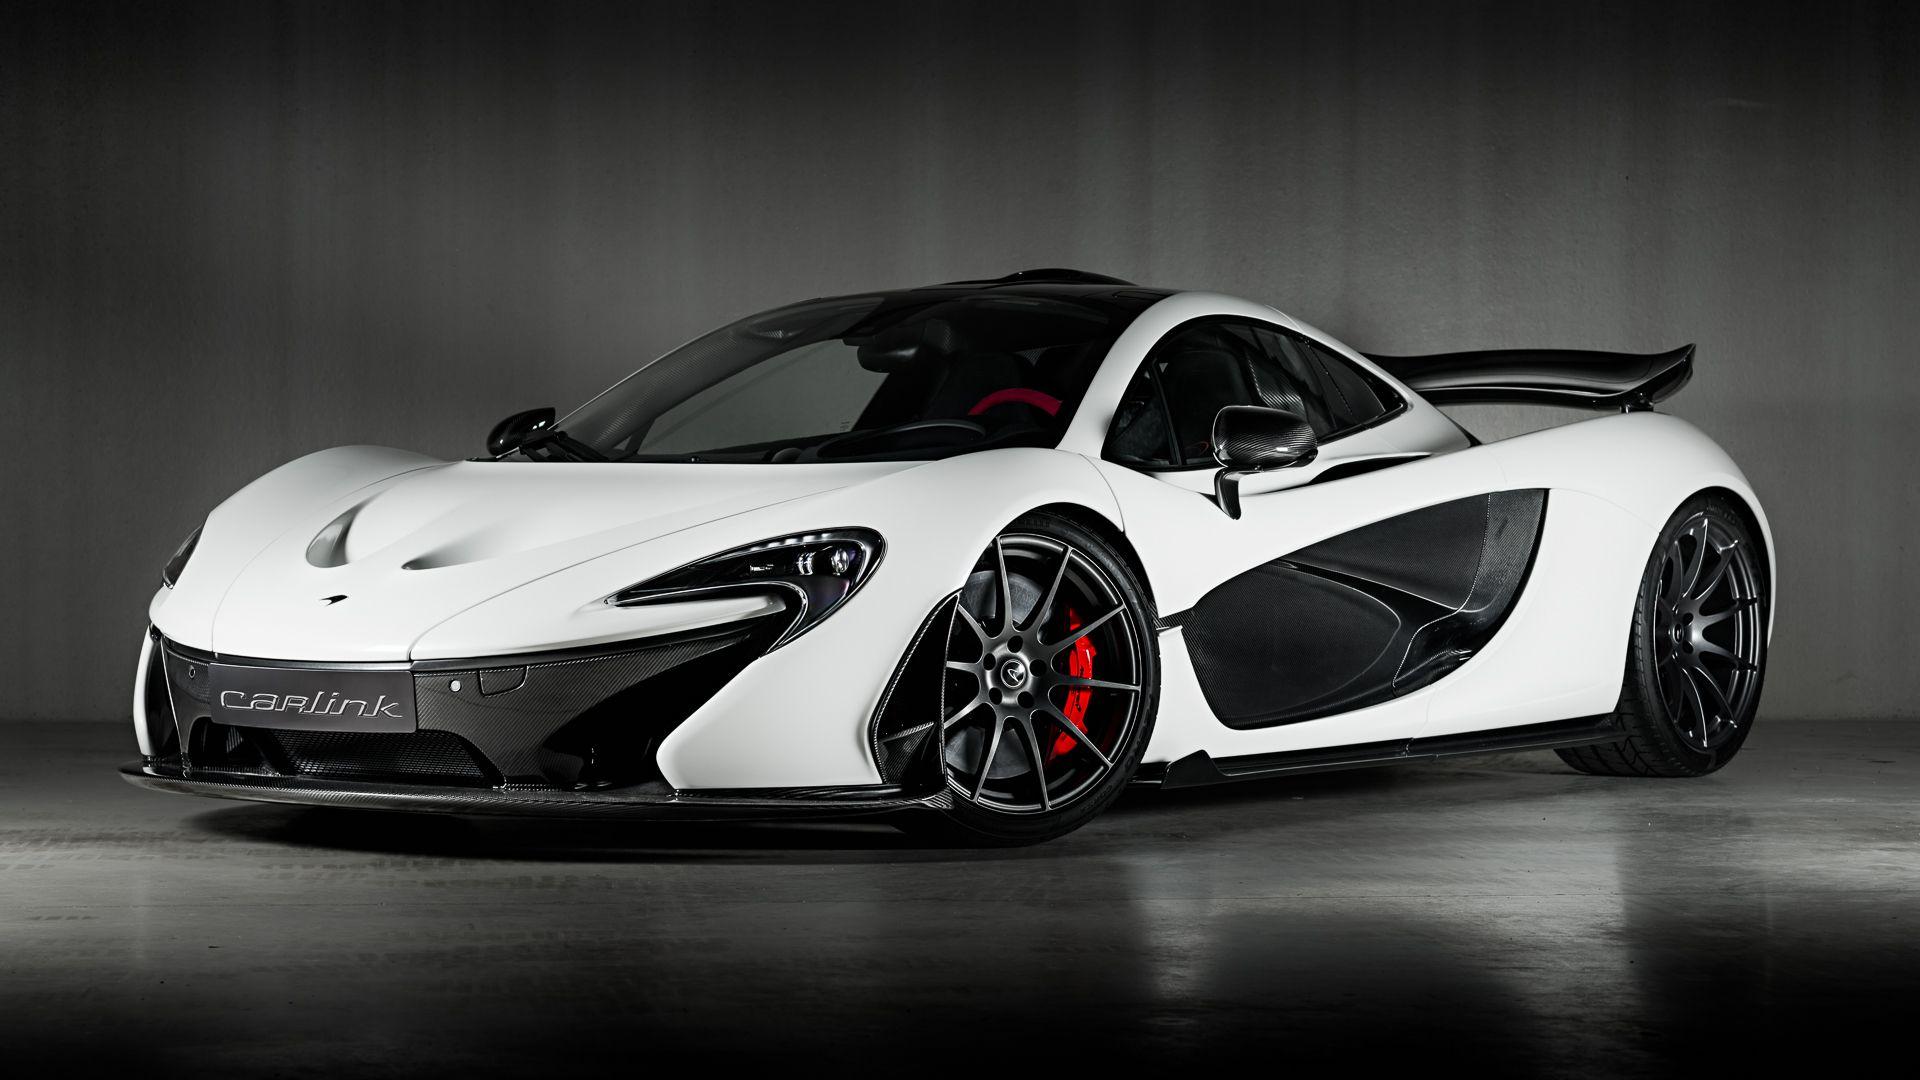 McLaren P1 White Best Wallpaper | Cool sports cars ...